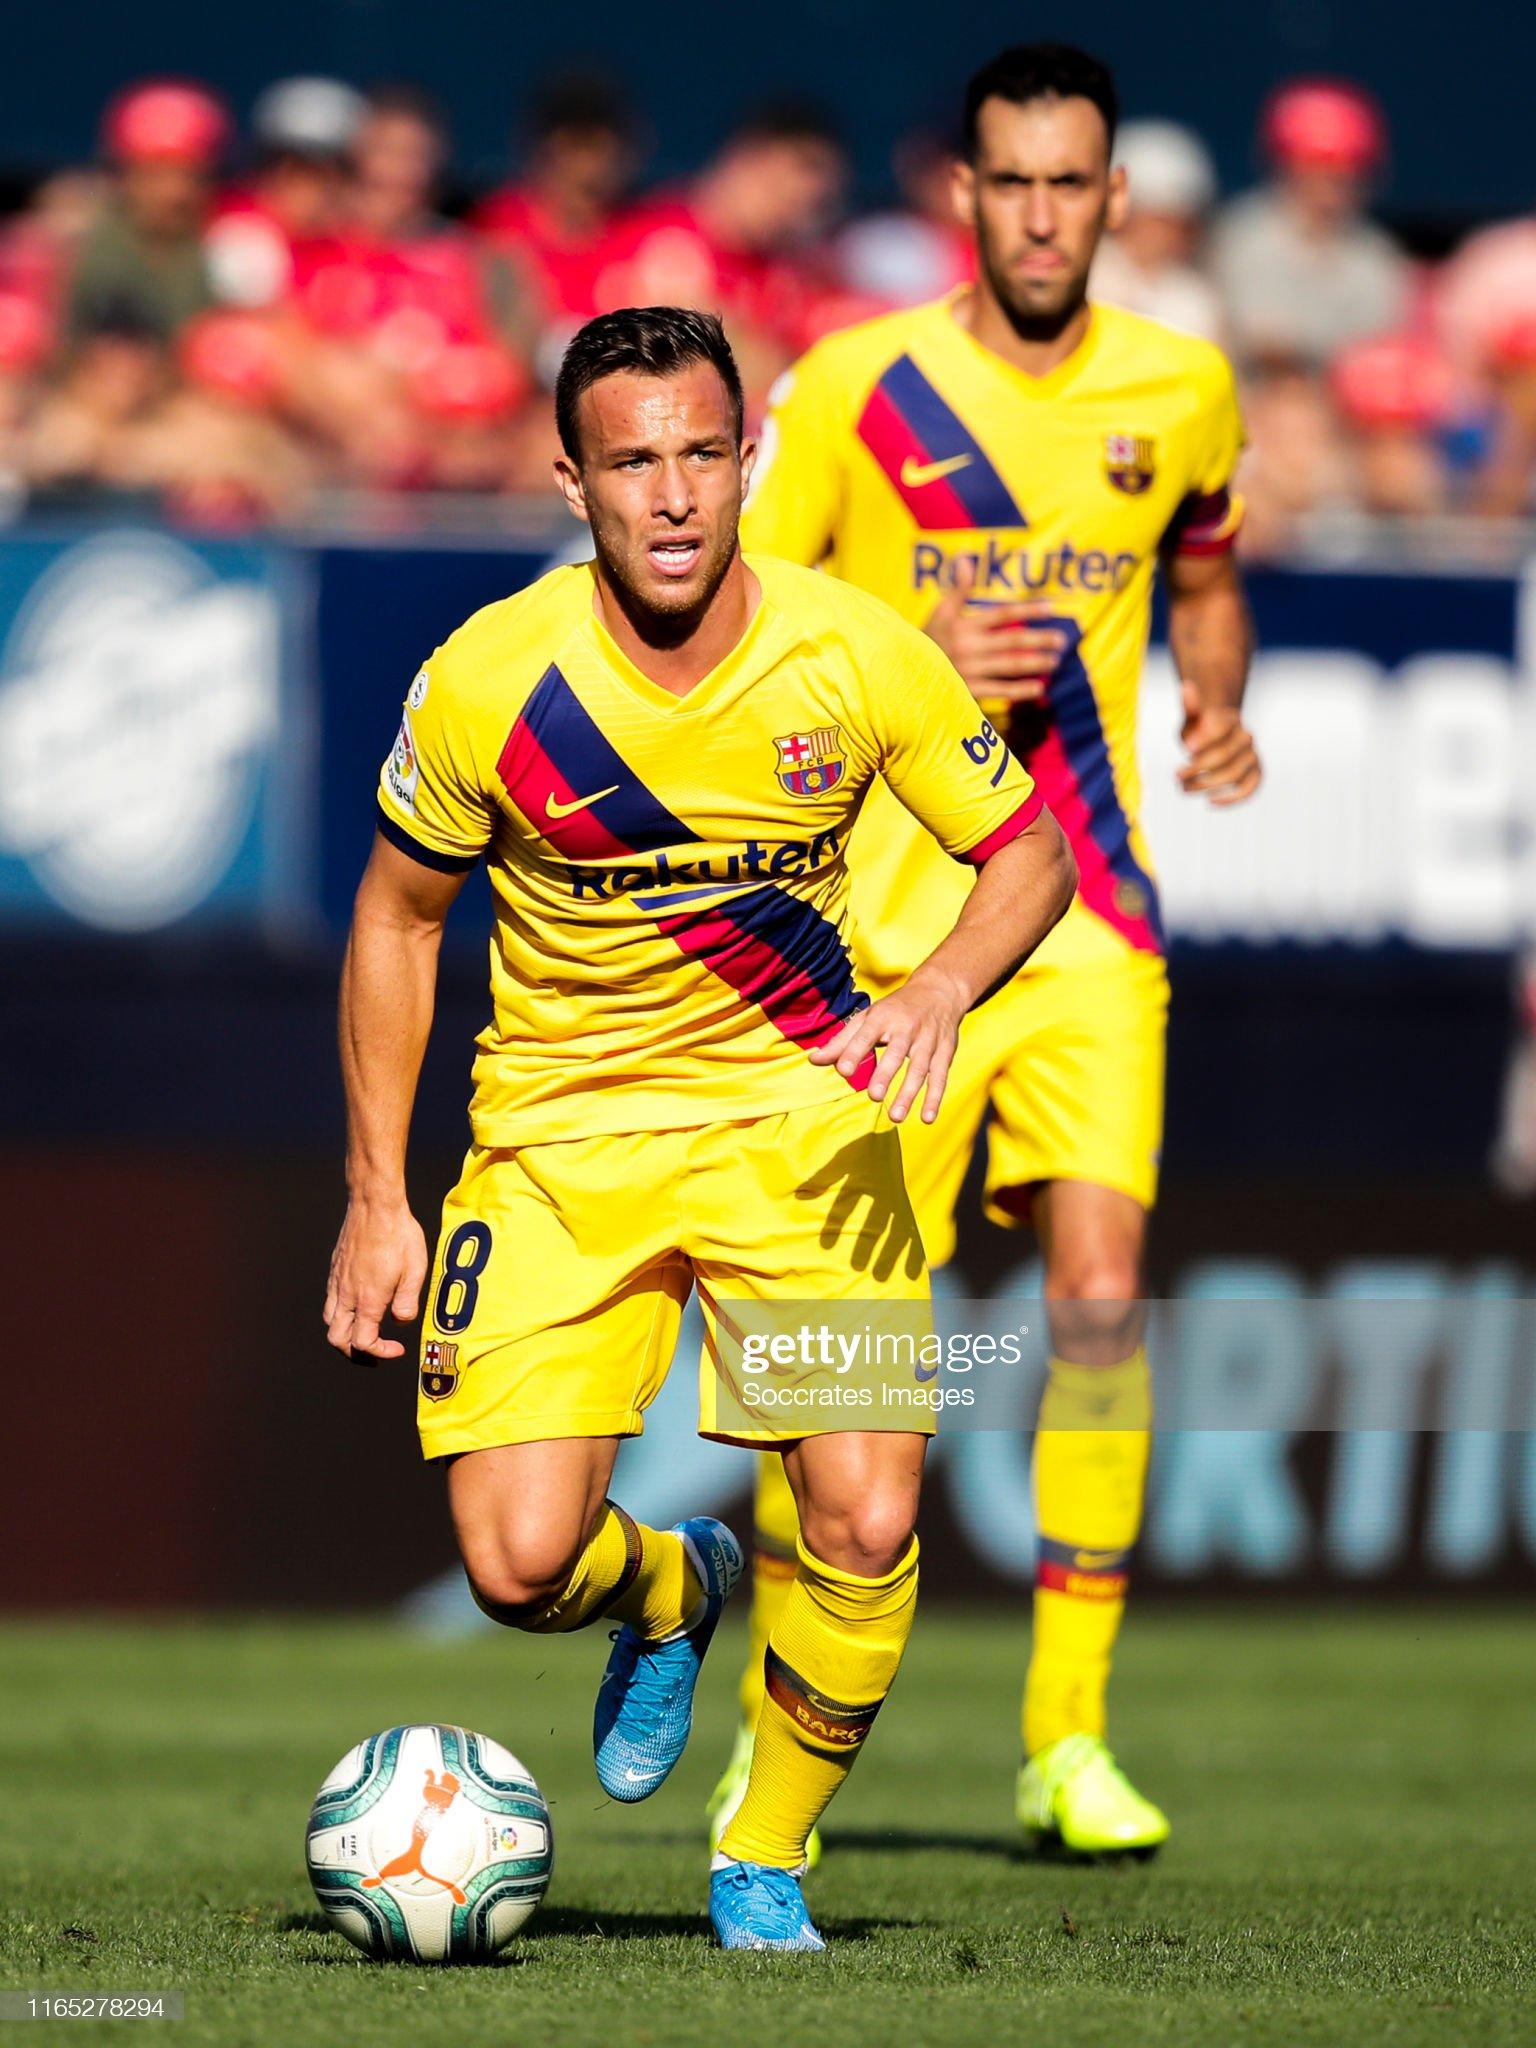 صور مباراة : أوساسونا - برشلونة 2-2 ( 31-08-2019 )  Arthur-of-fc-barcelona-during-the-la-liga-santander-match-between-v-picture-id1165278294?s=2048x2048